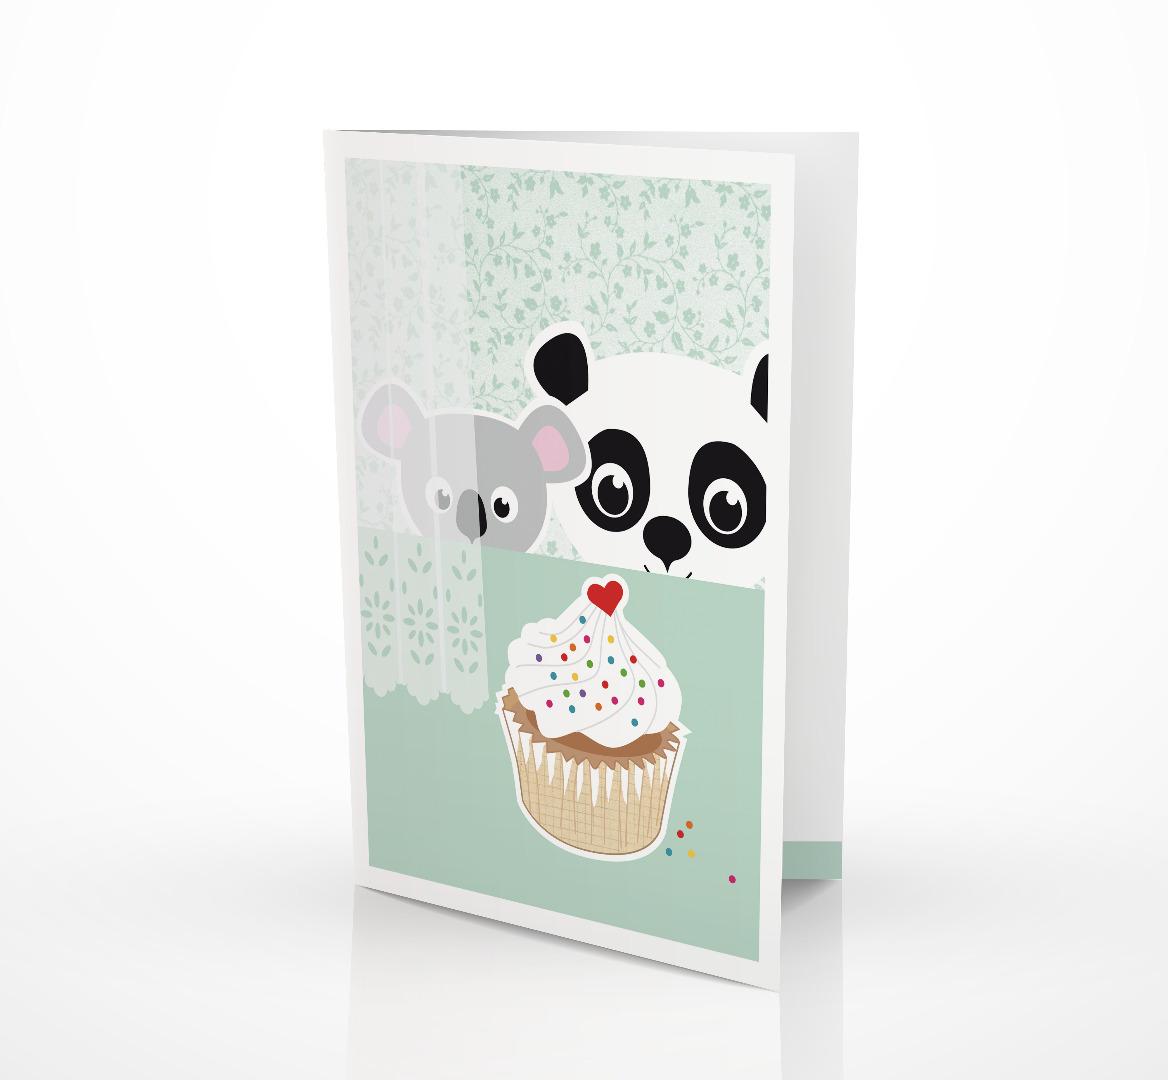 Grußkarte Panda & Koala, Geburtstagskarte - 2